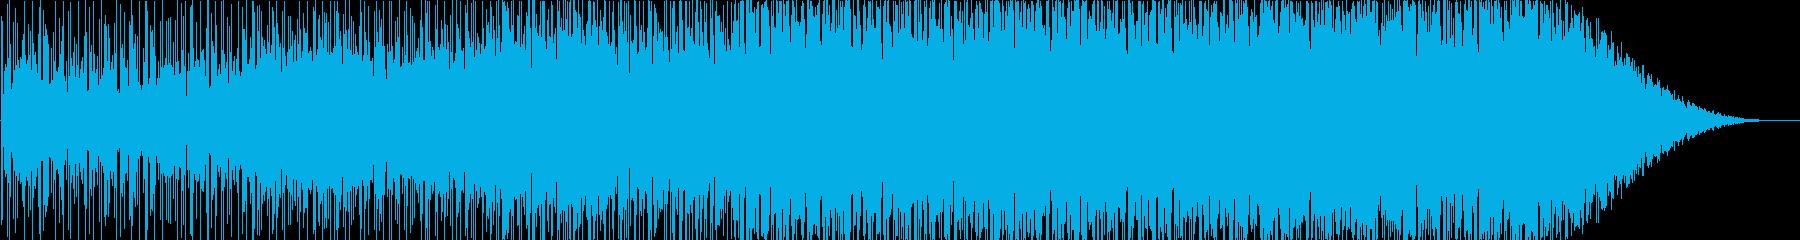 Ultramontaneの再生済みの波形